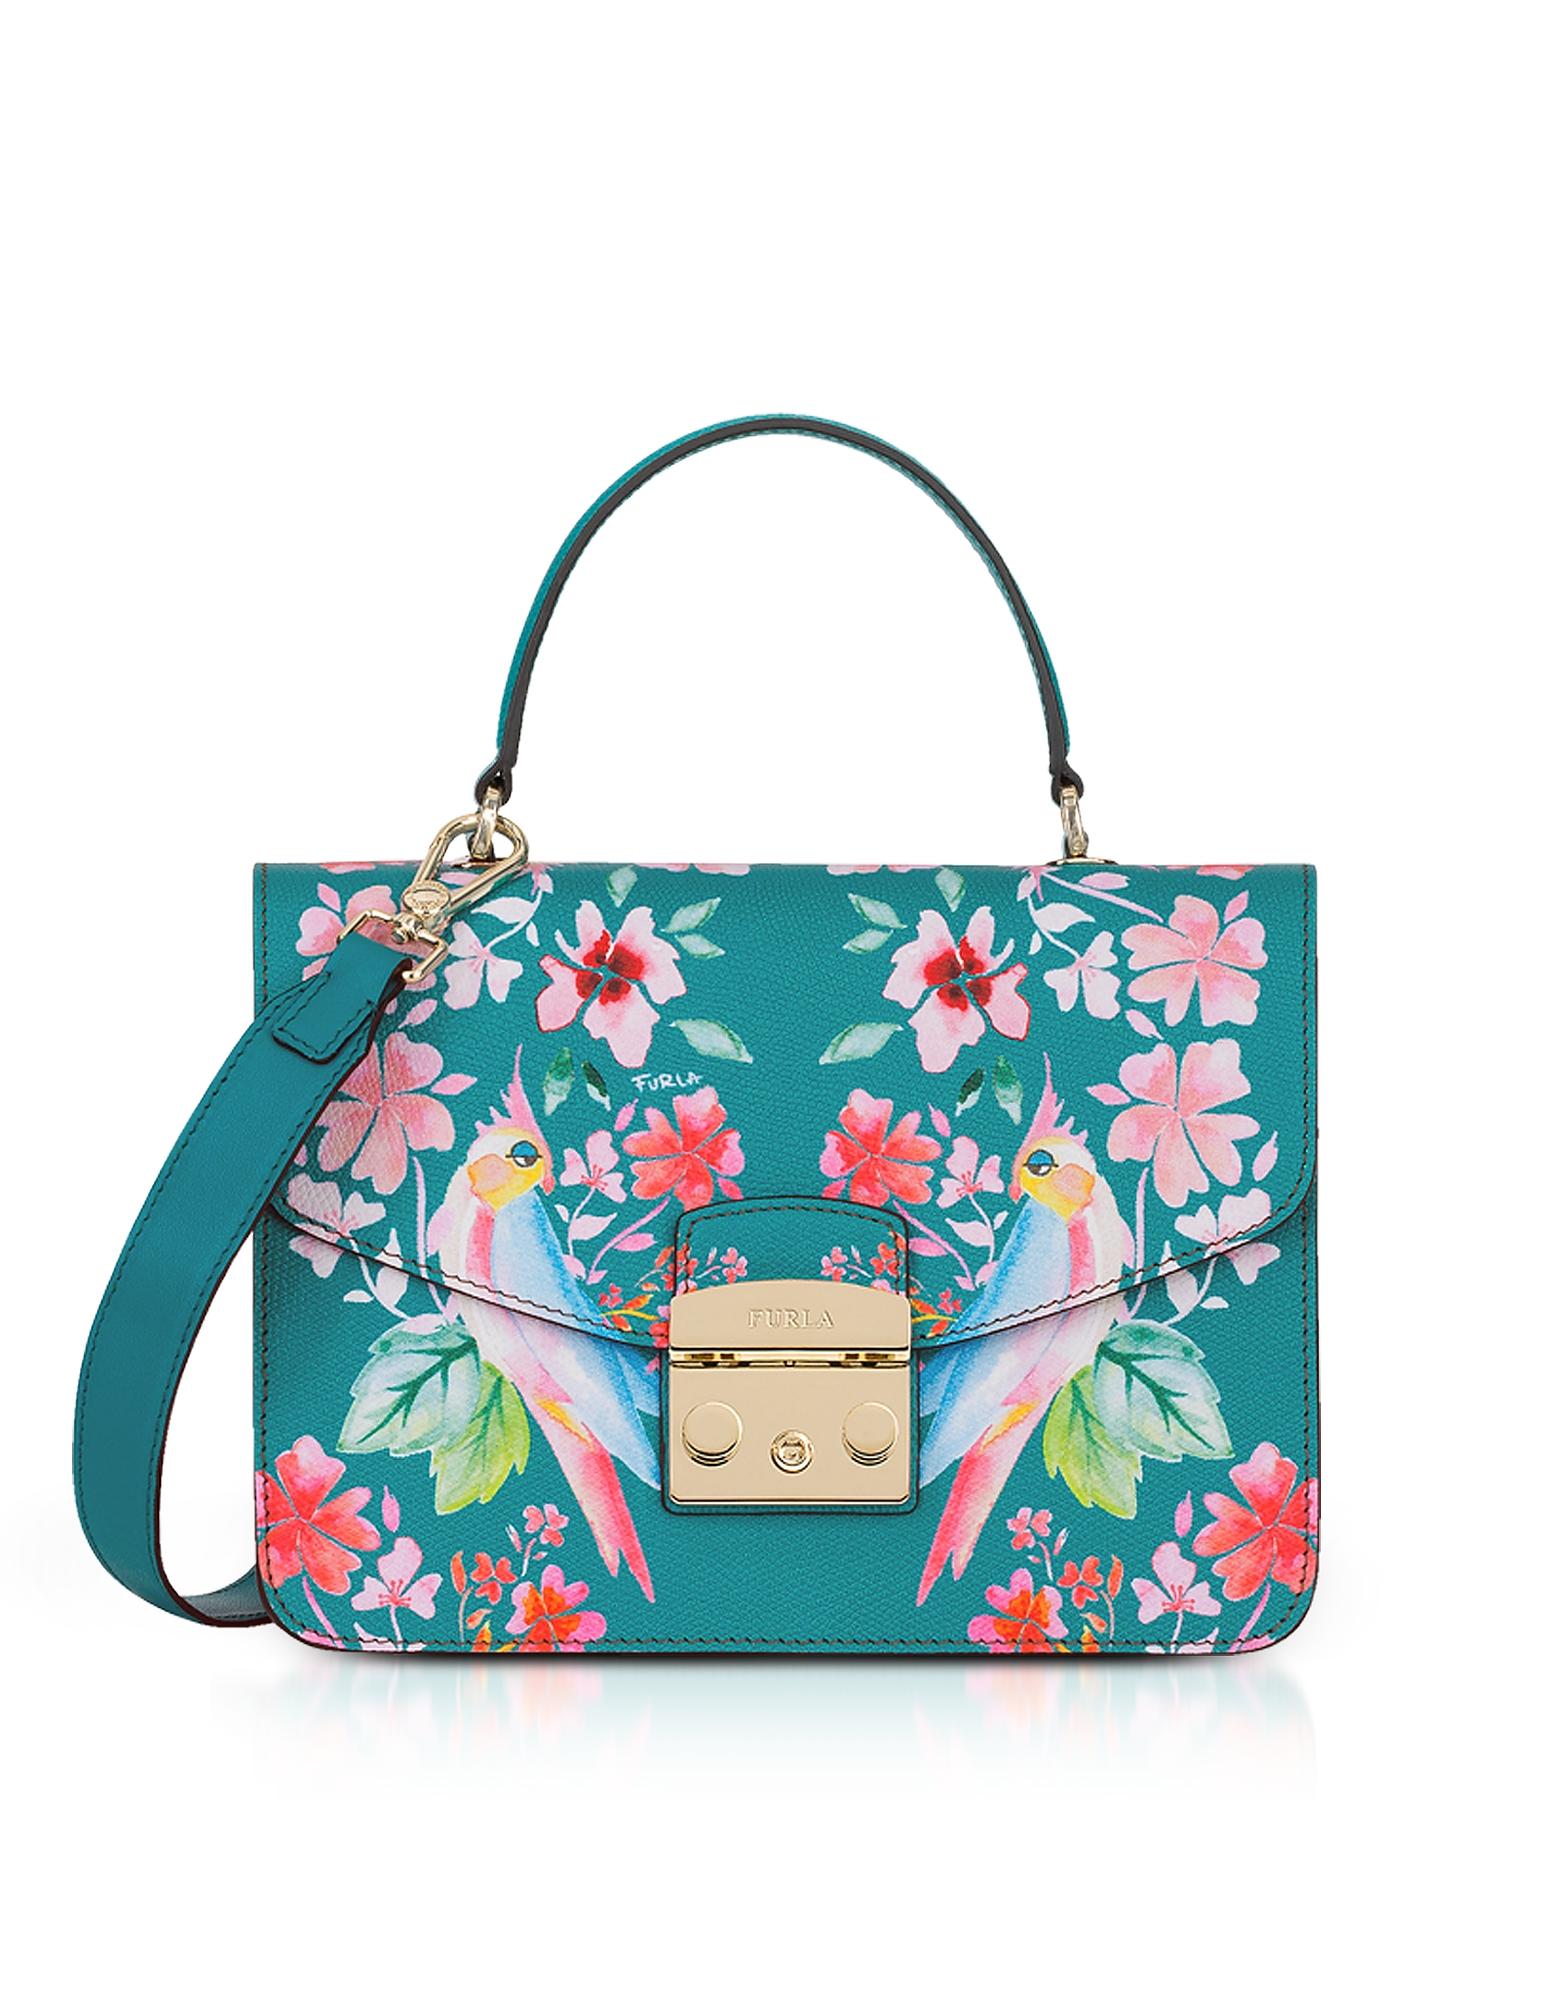 Image of Furla Designer Handbags, Cocorita Printed Leather Metropolis Small Top-Handle Shoulder Bag